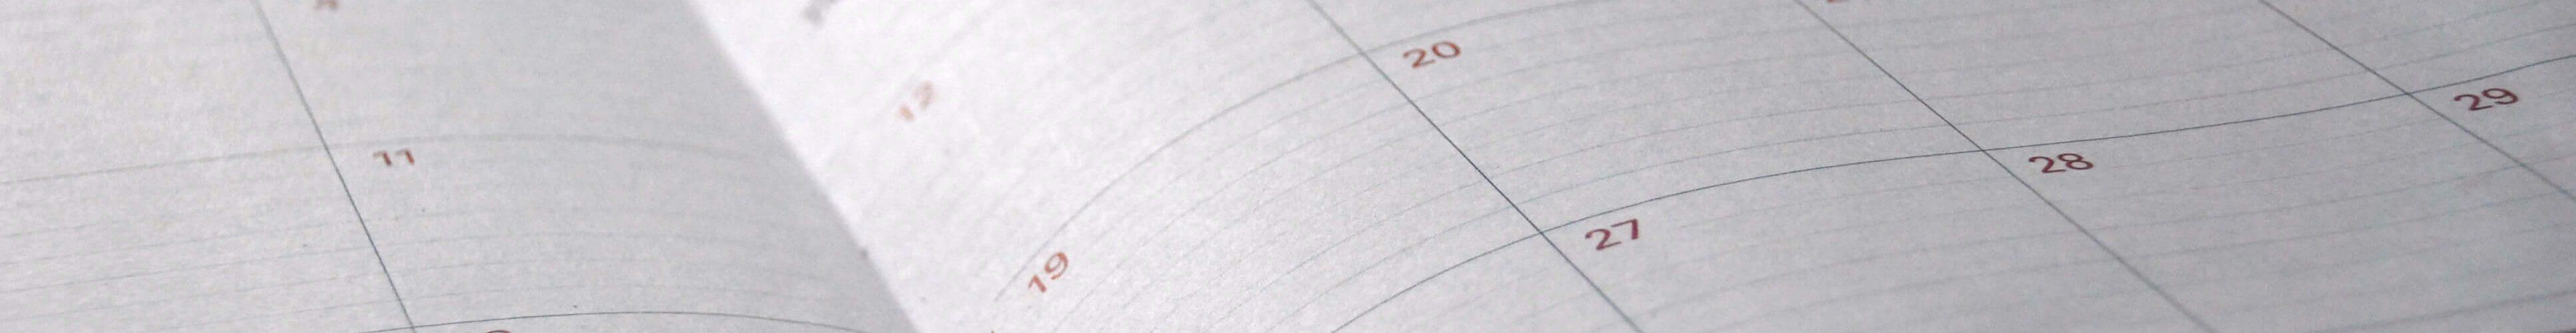 datum im lebenslauf kalender - Datum Lebenslauf